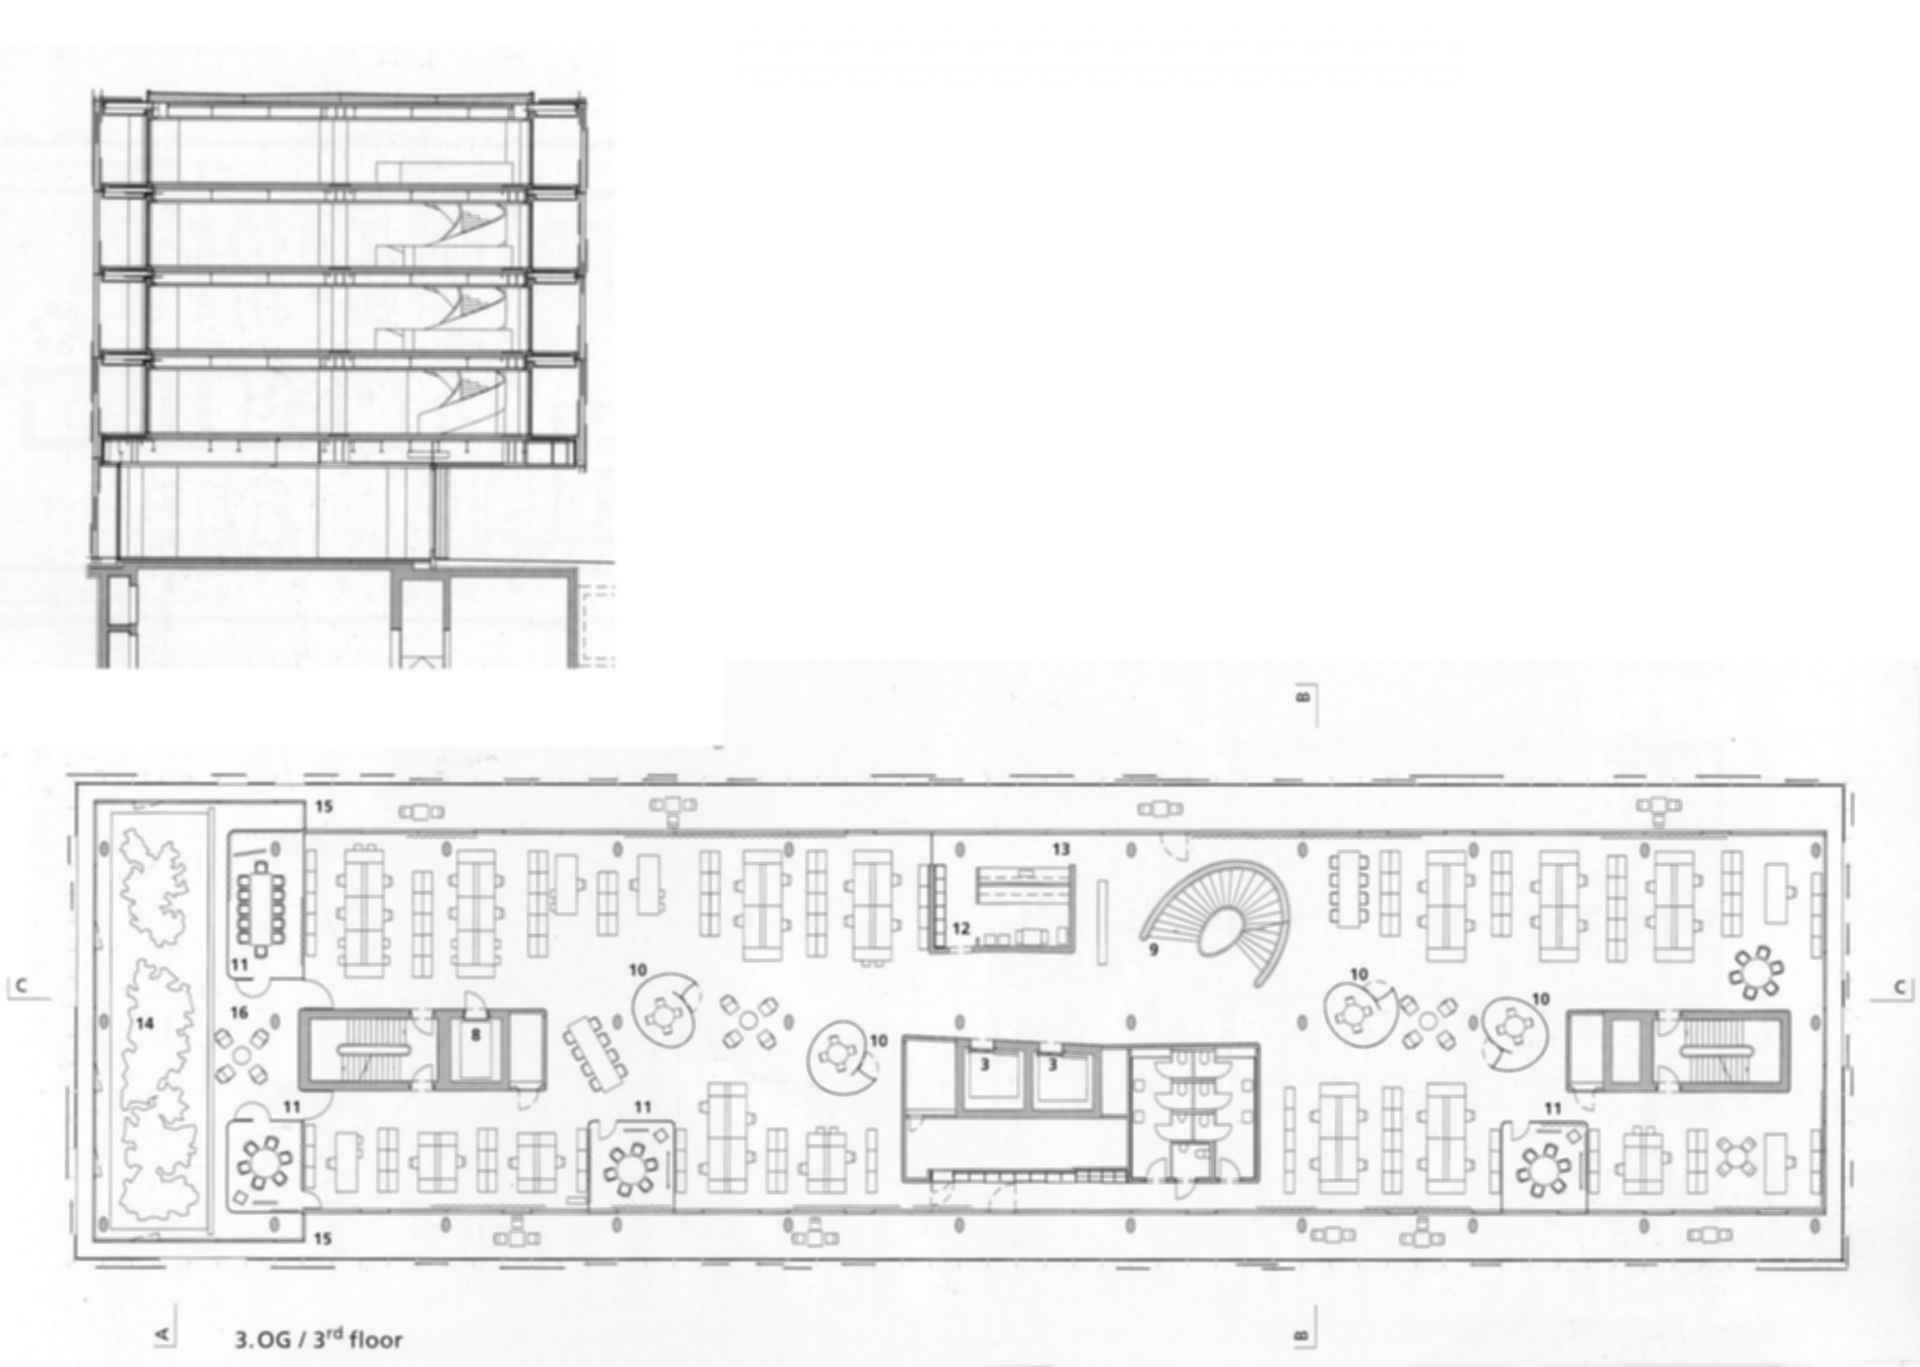 Novartis Campus Forum 3 - Floor Plan